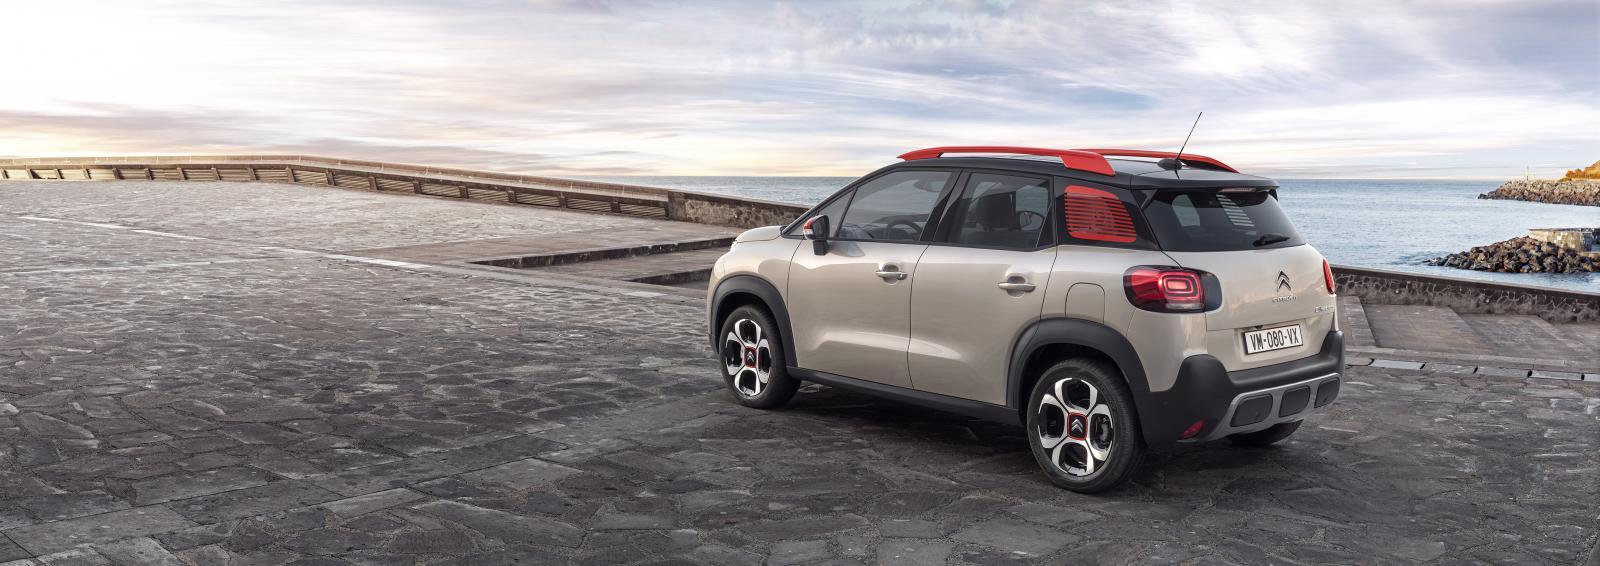 SUV Compact C3 Aircross – zachód słońca